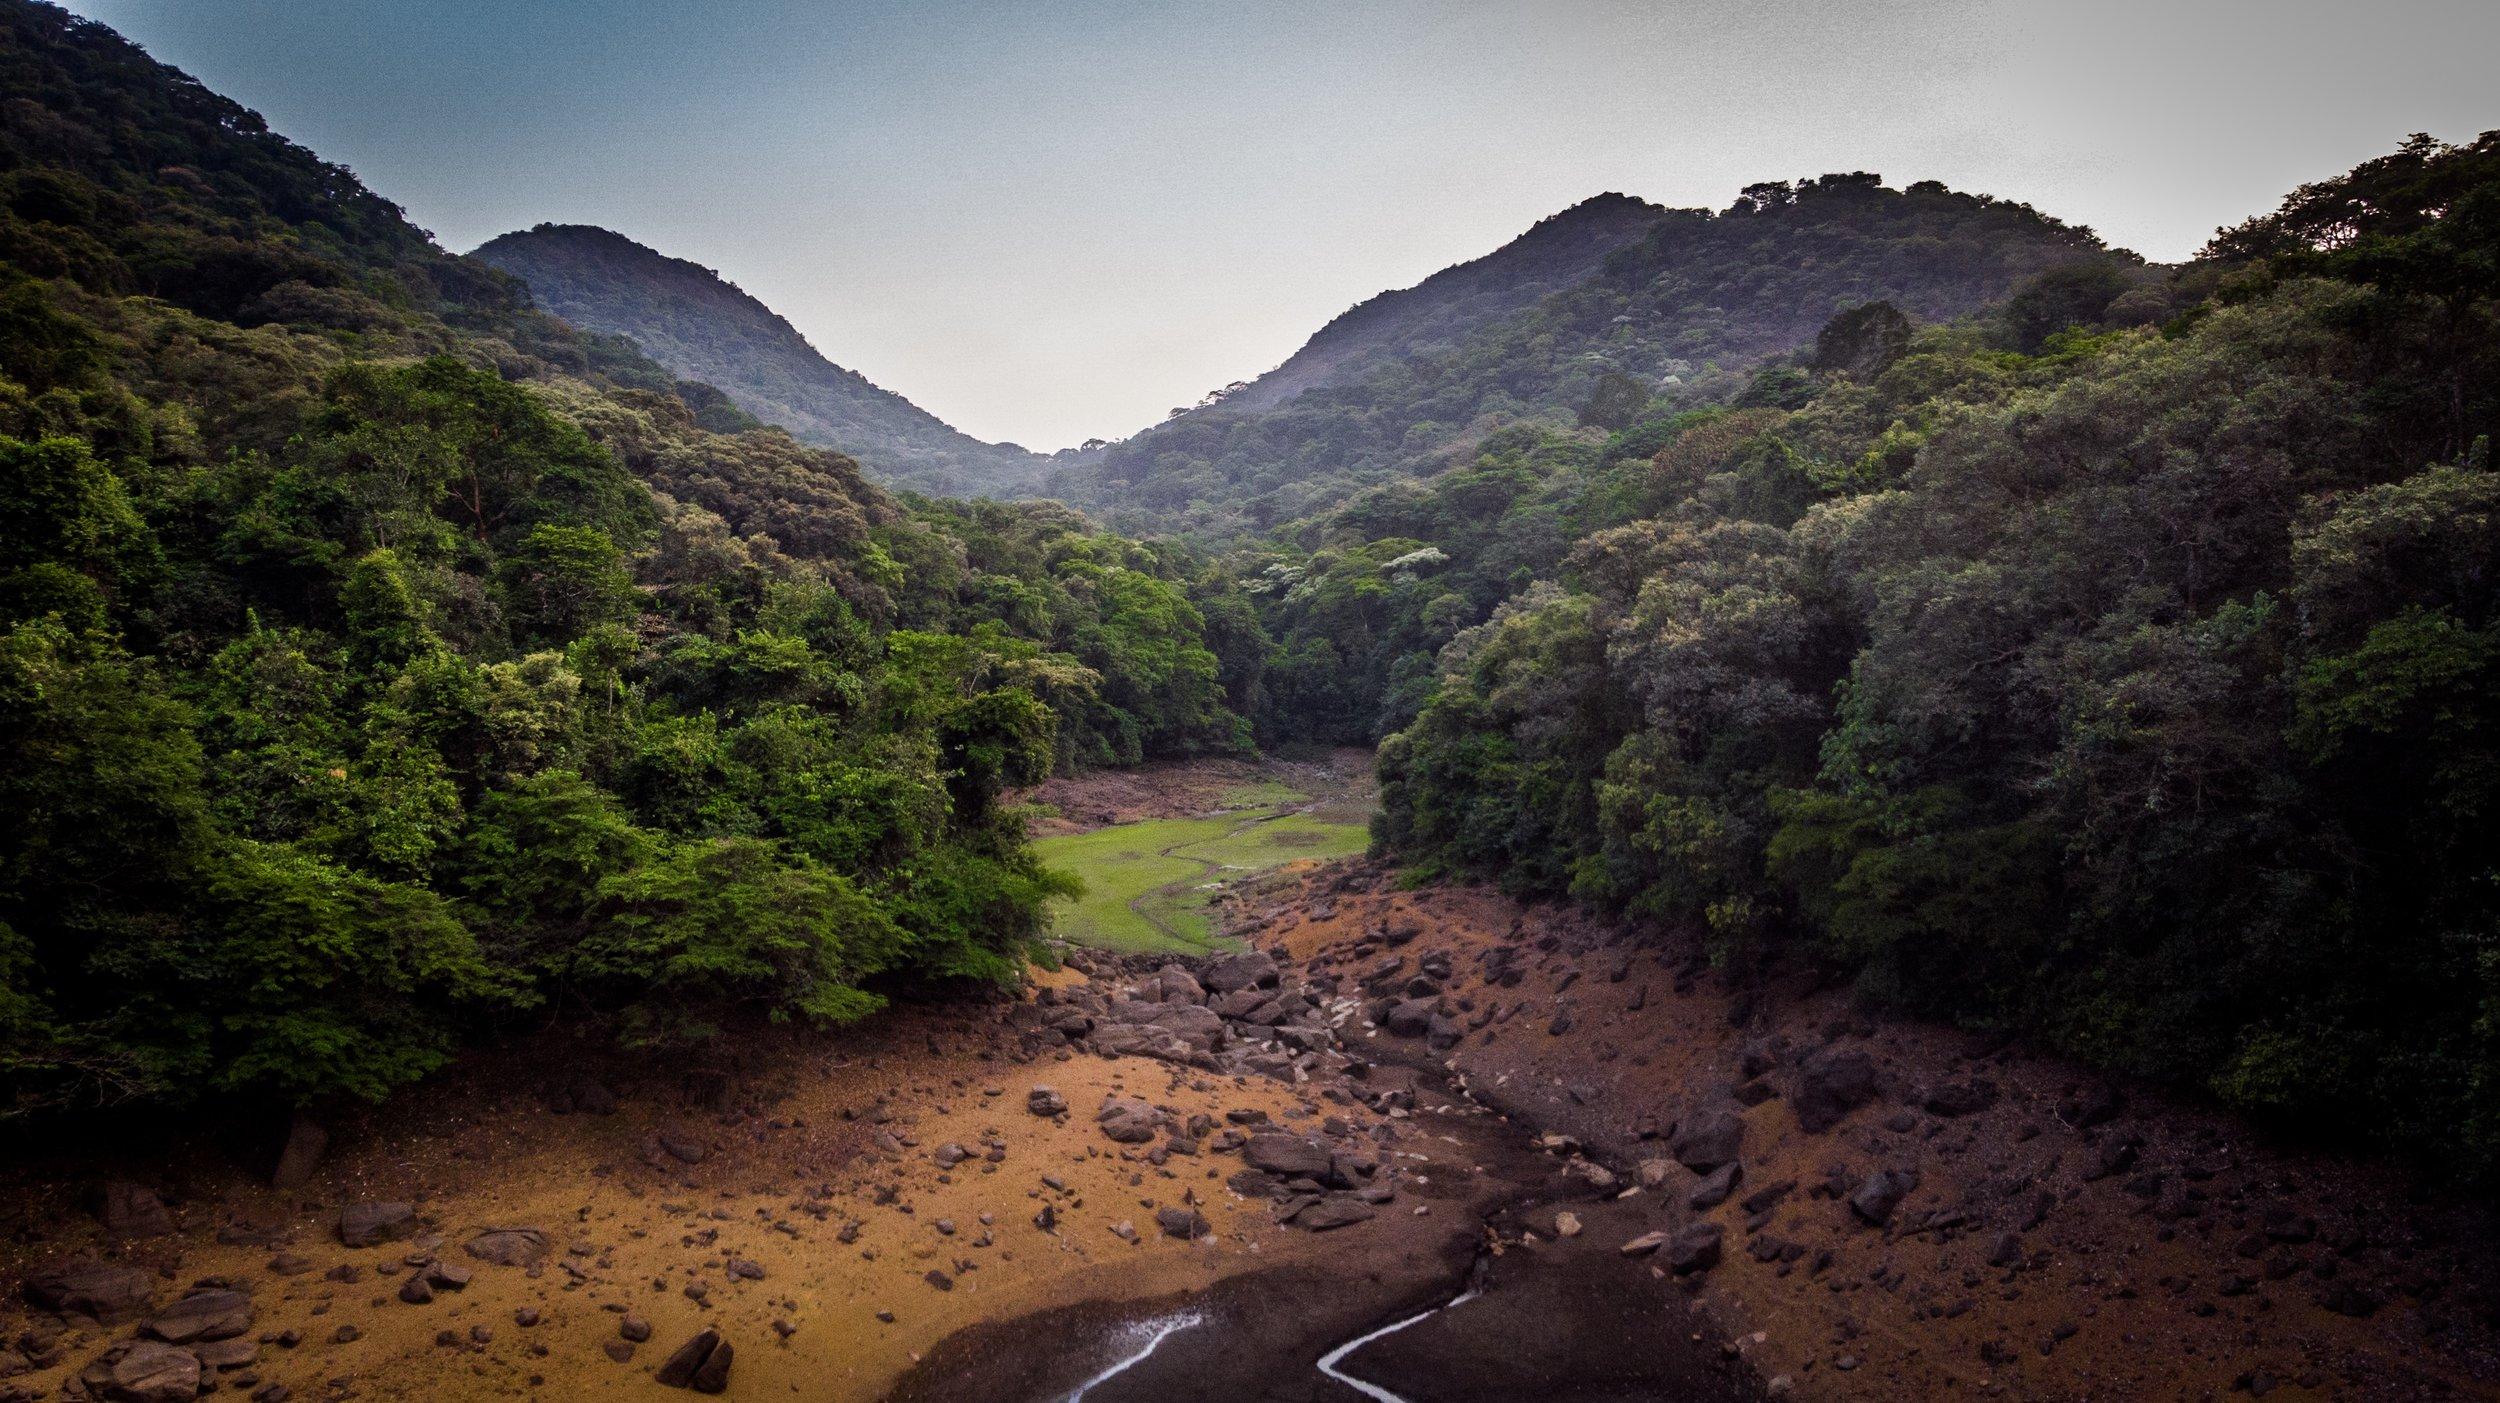 Sierraleone-vickieremoe-environment-rainforest-conservation-photos-radwanskeiky5.JPG